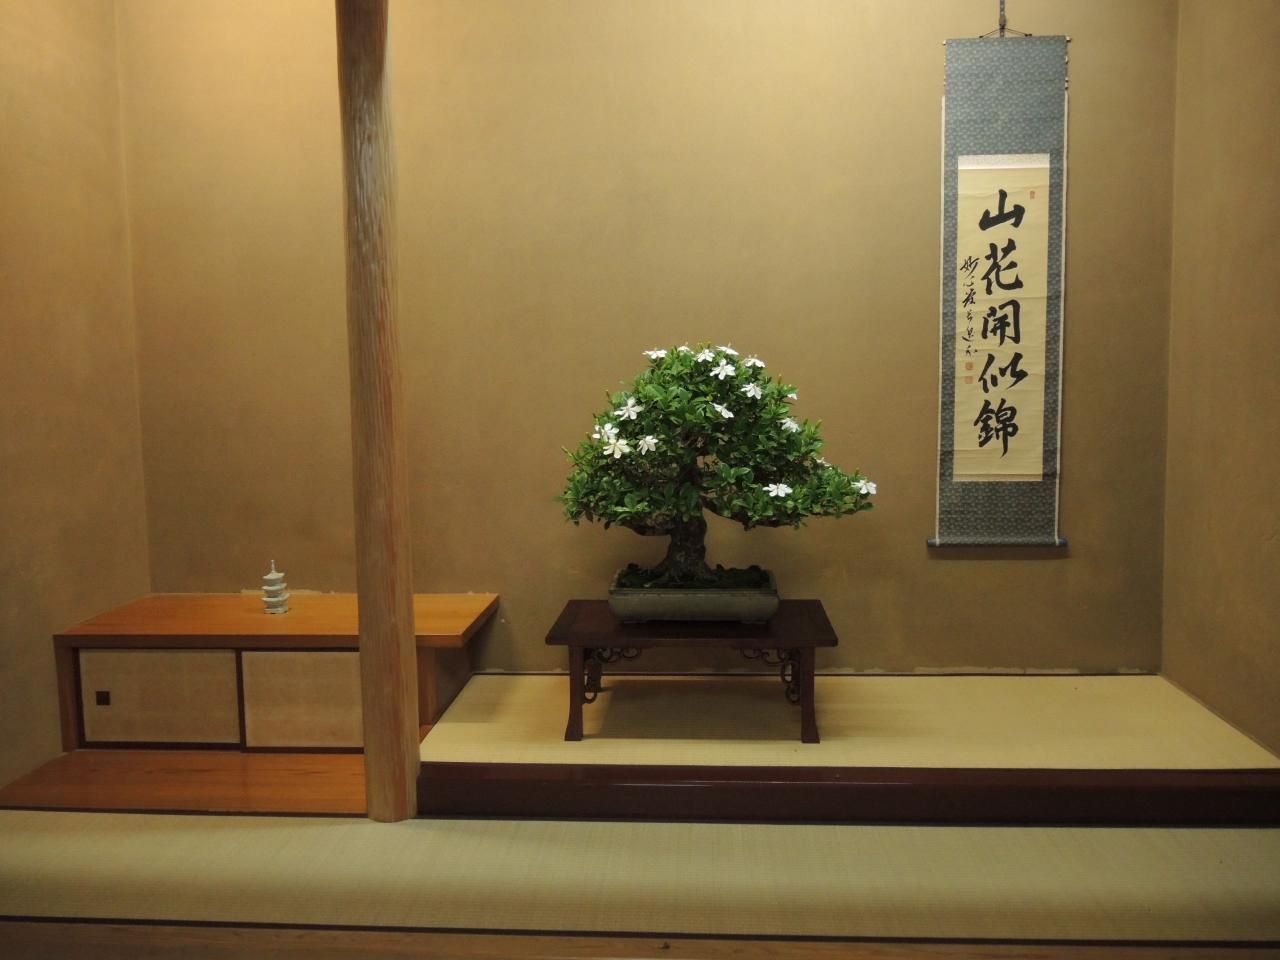 Katsura Leaf Bonsai Tokonoma Trials